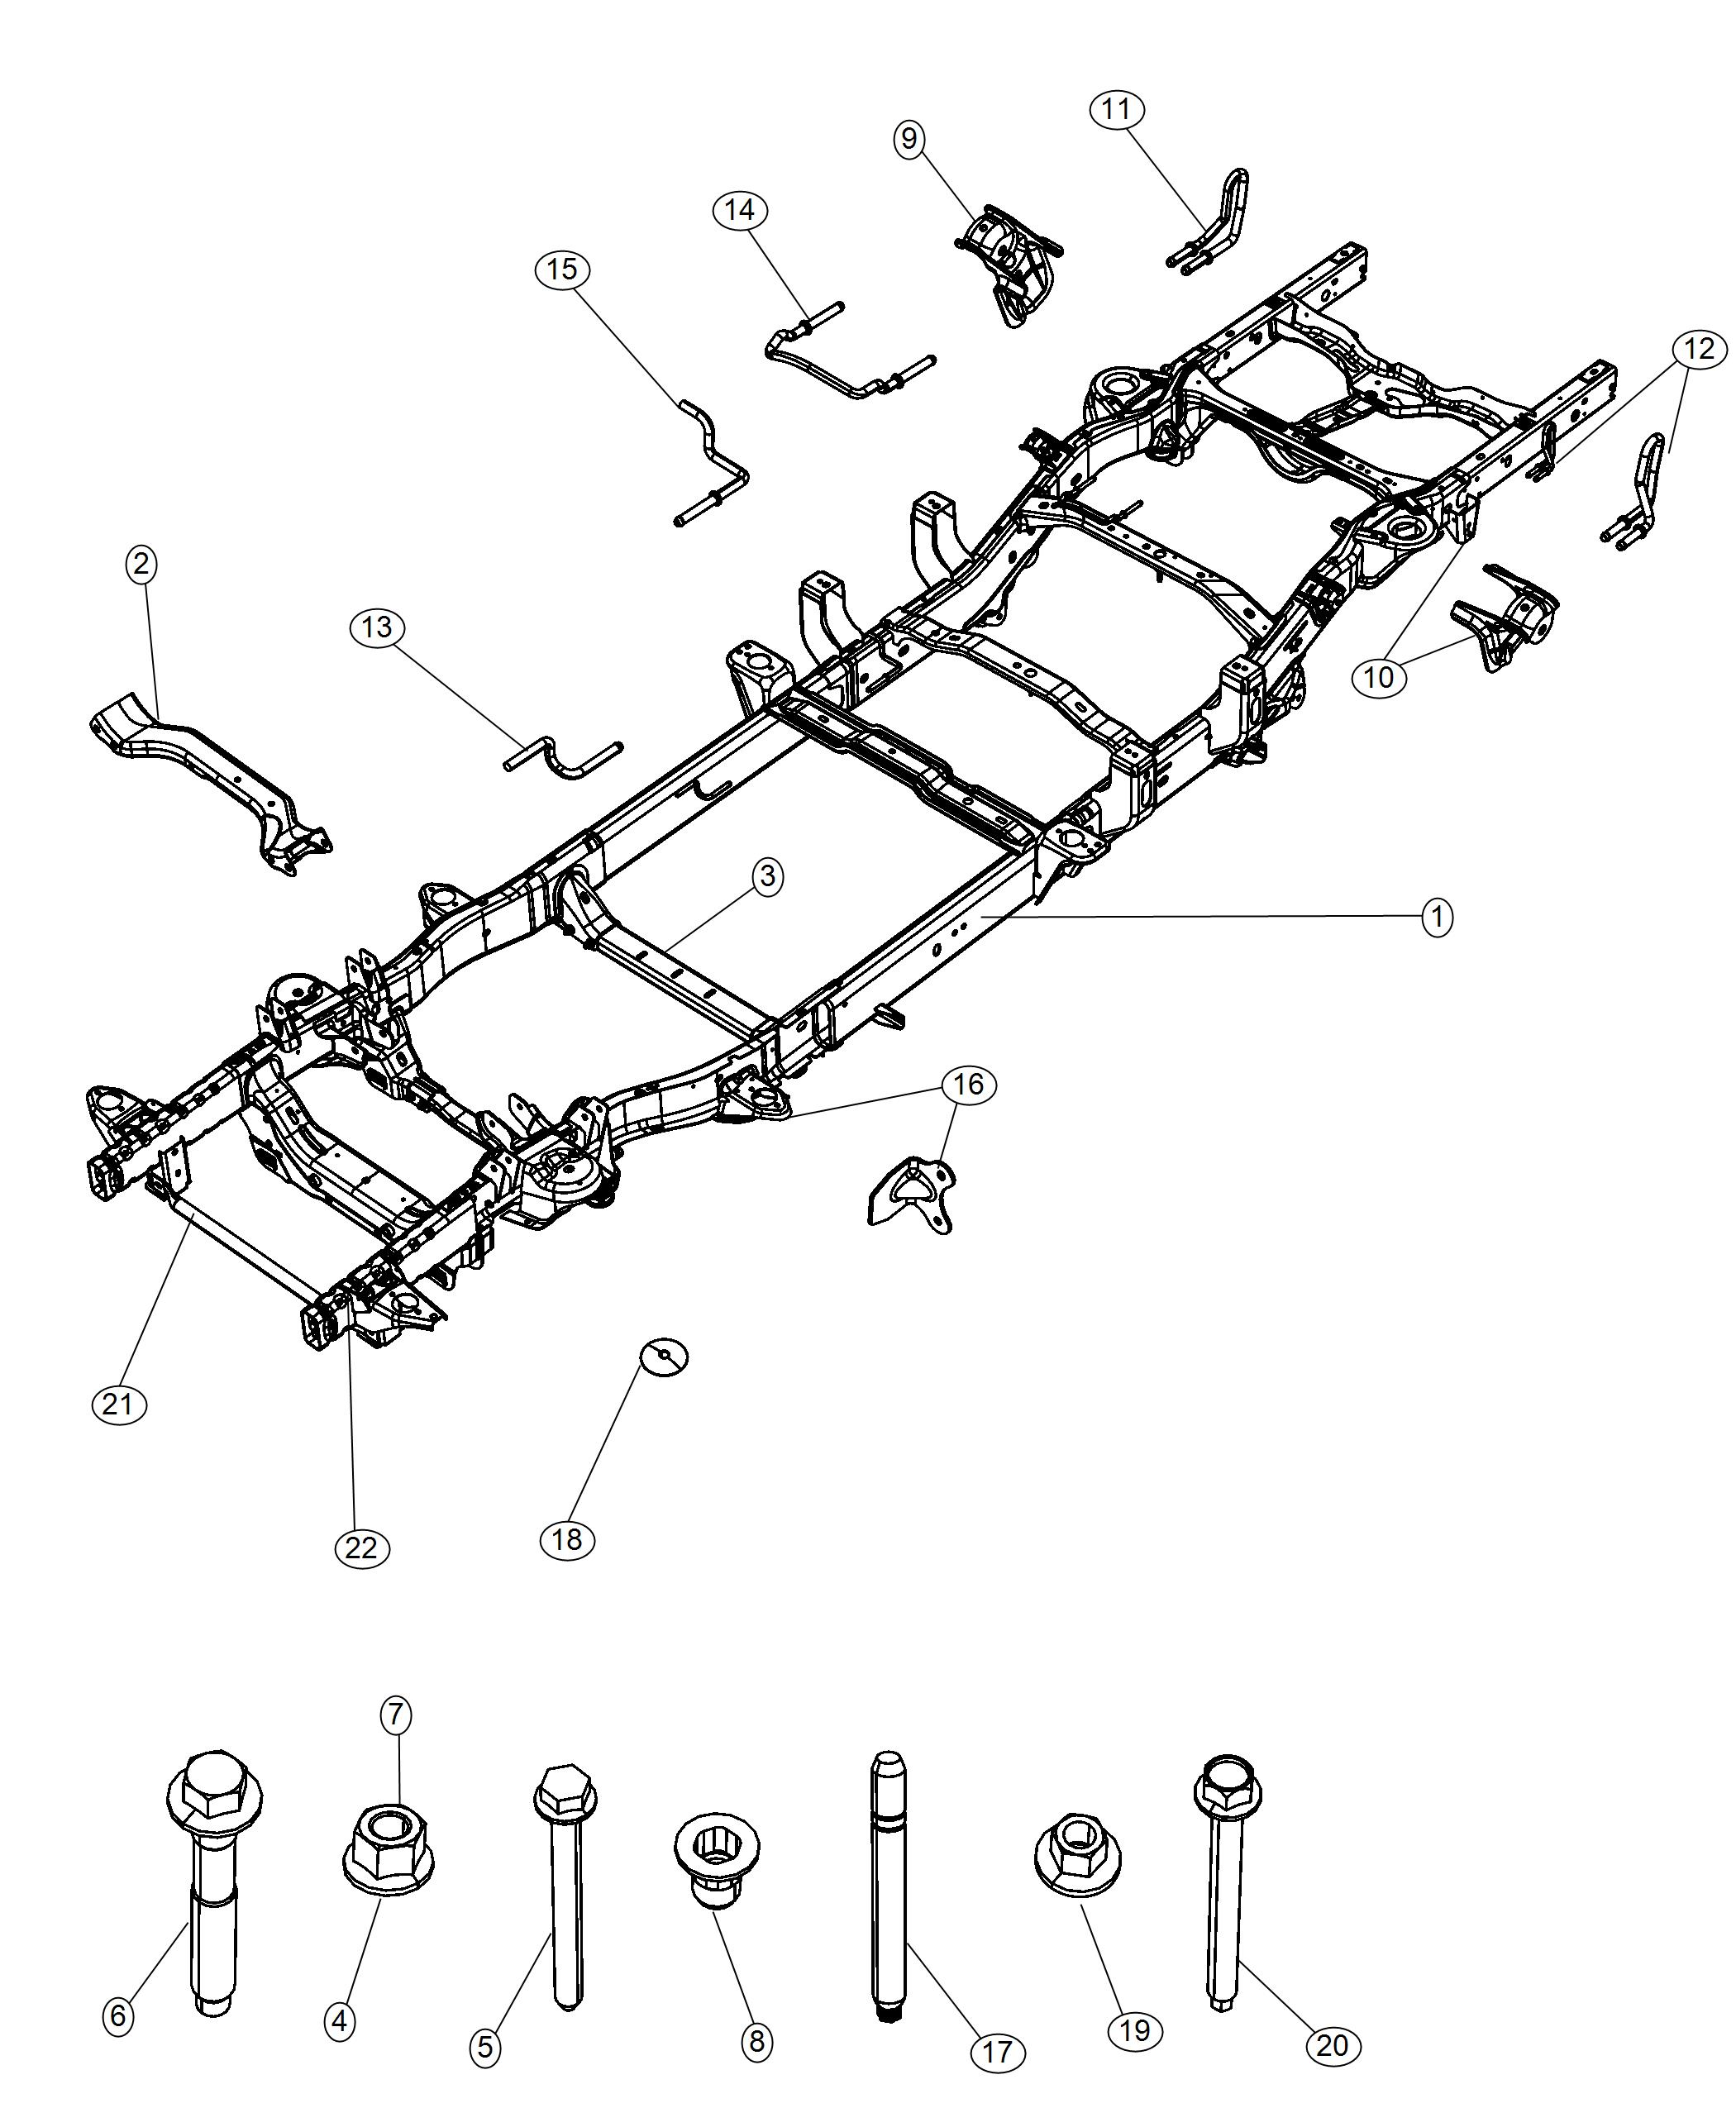 Ram Frame Assembly Chassis Engine Vvt Spd